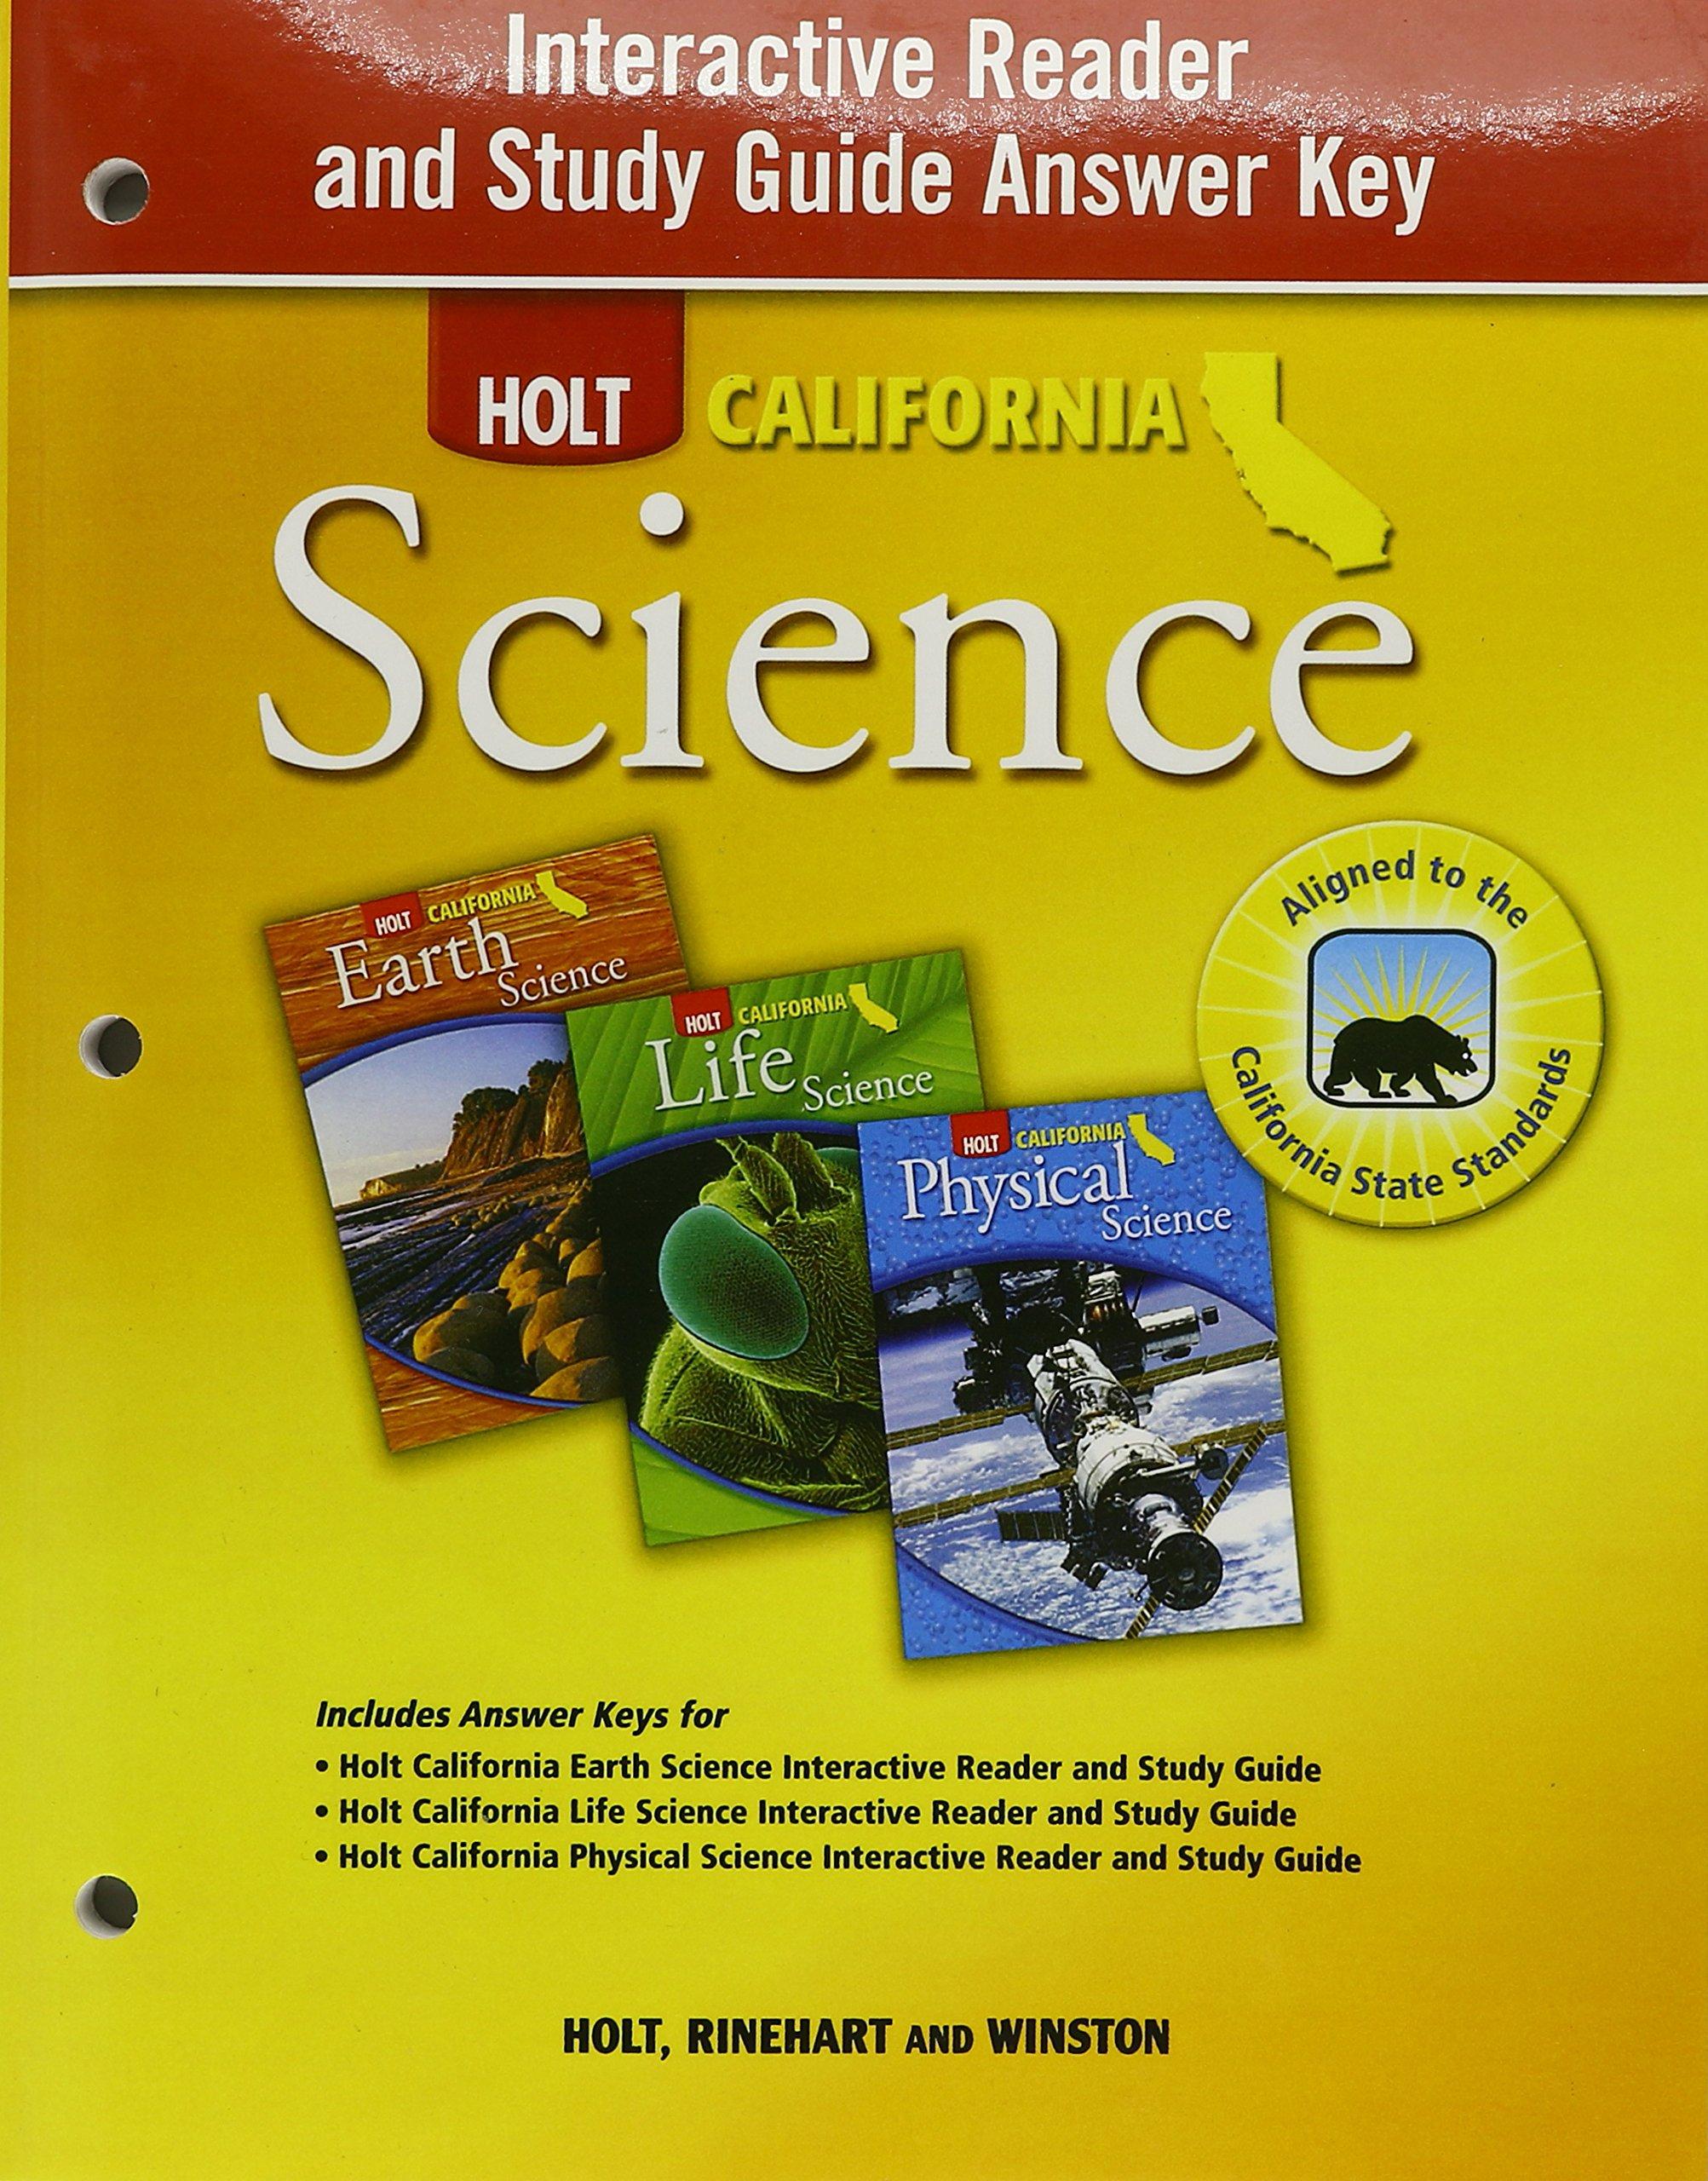 Amazon holt science technology california interactive reader amazon holt science technology california interactive reader and study guide with answer key grades 6 8 9780030924965 rinehart and winston holt fandeluxe Images